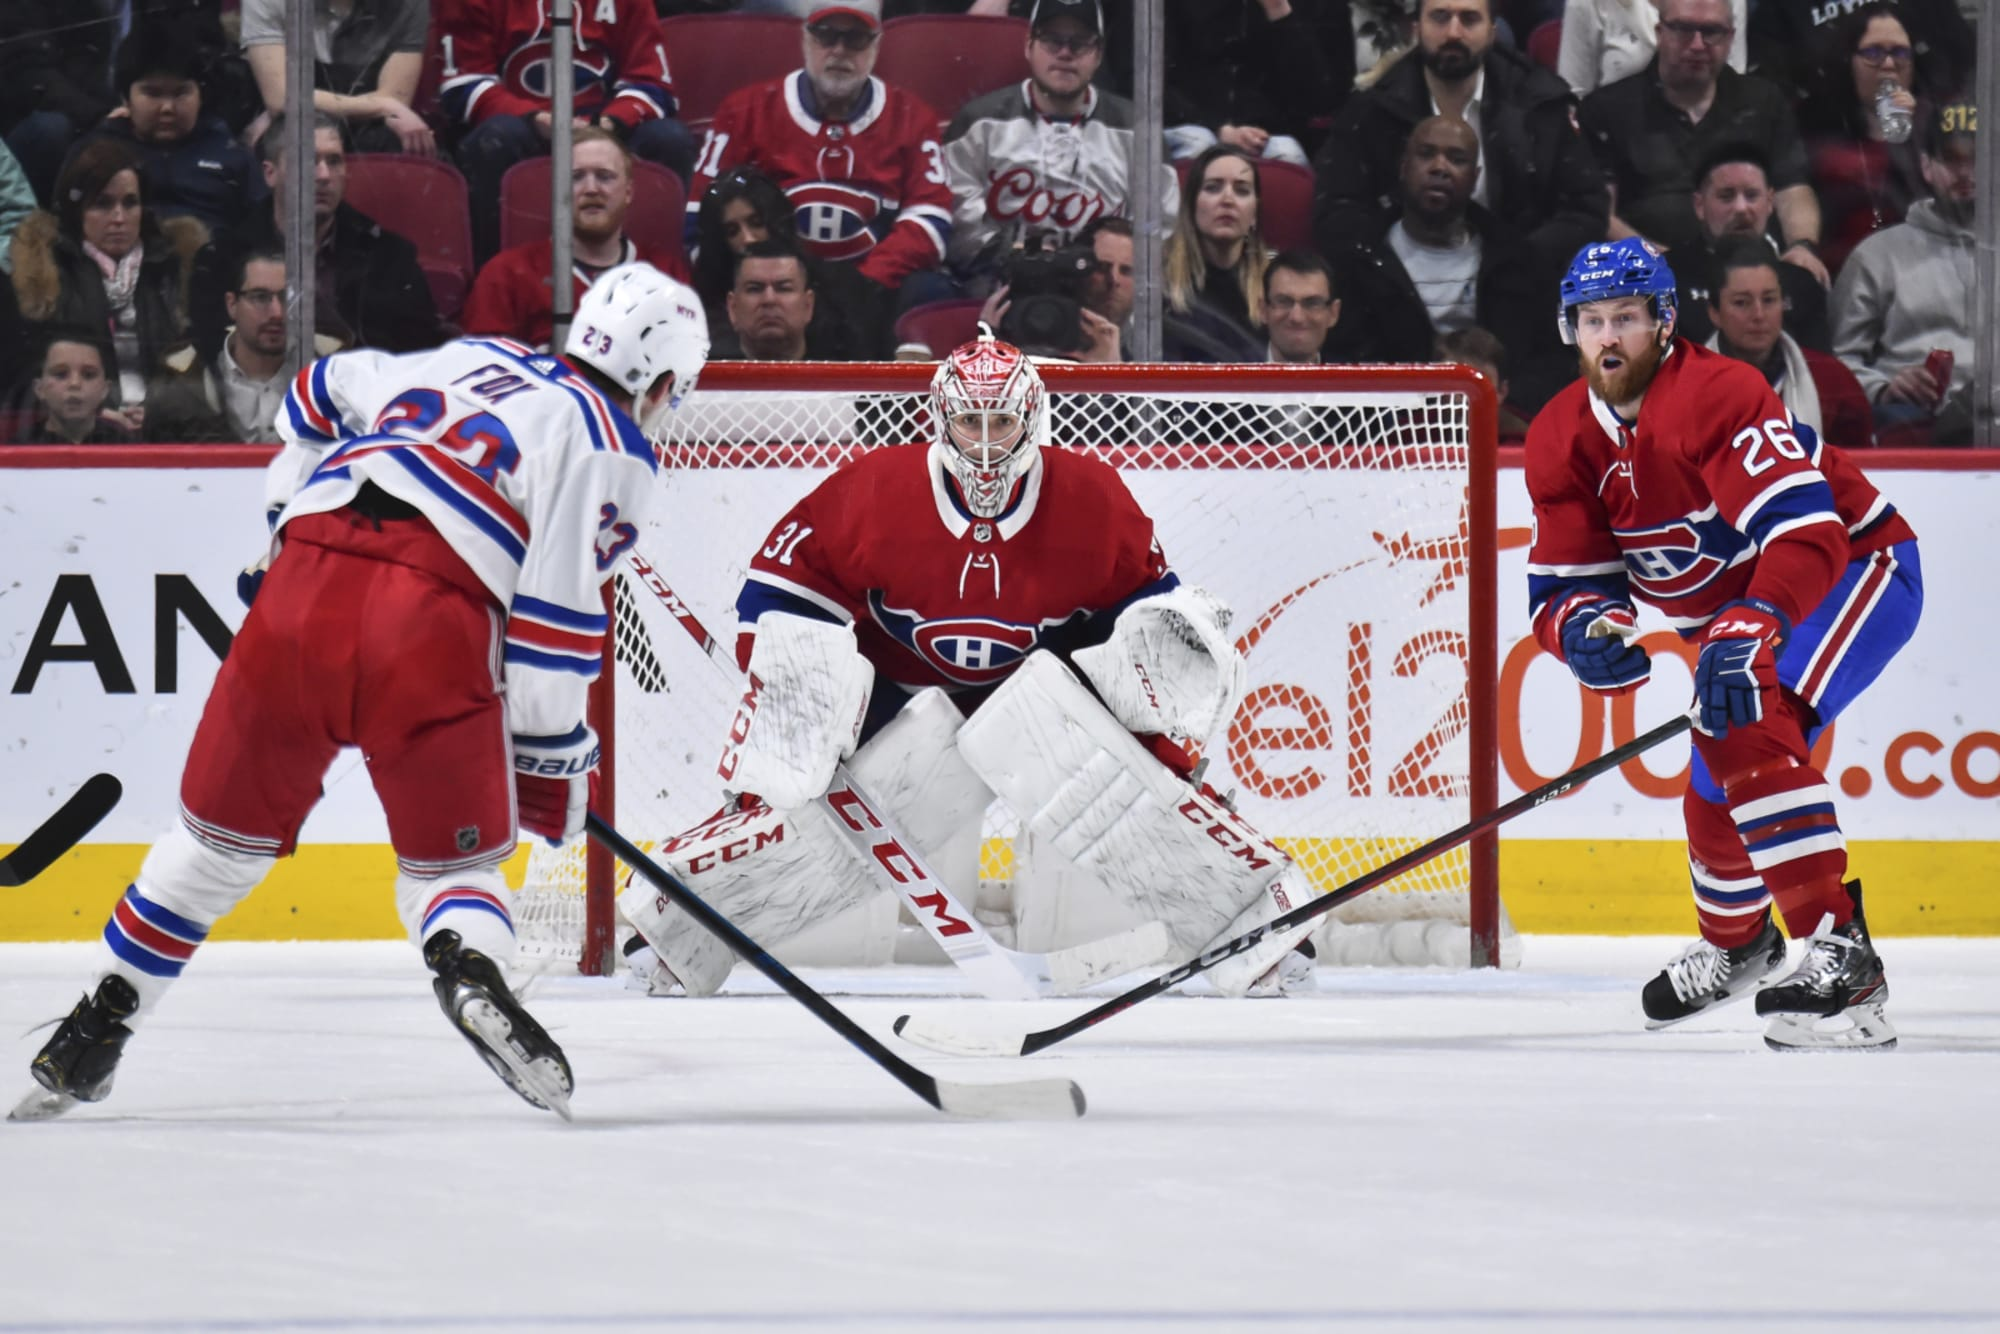 Game 3 Preview: Rangers vs Canadiens – Ducharme Shuffles His Lines